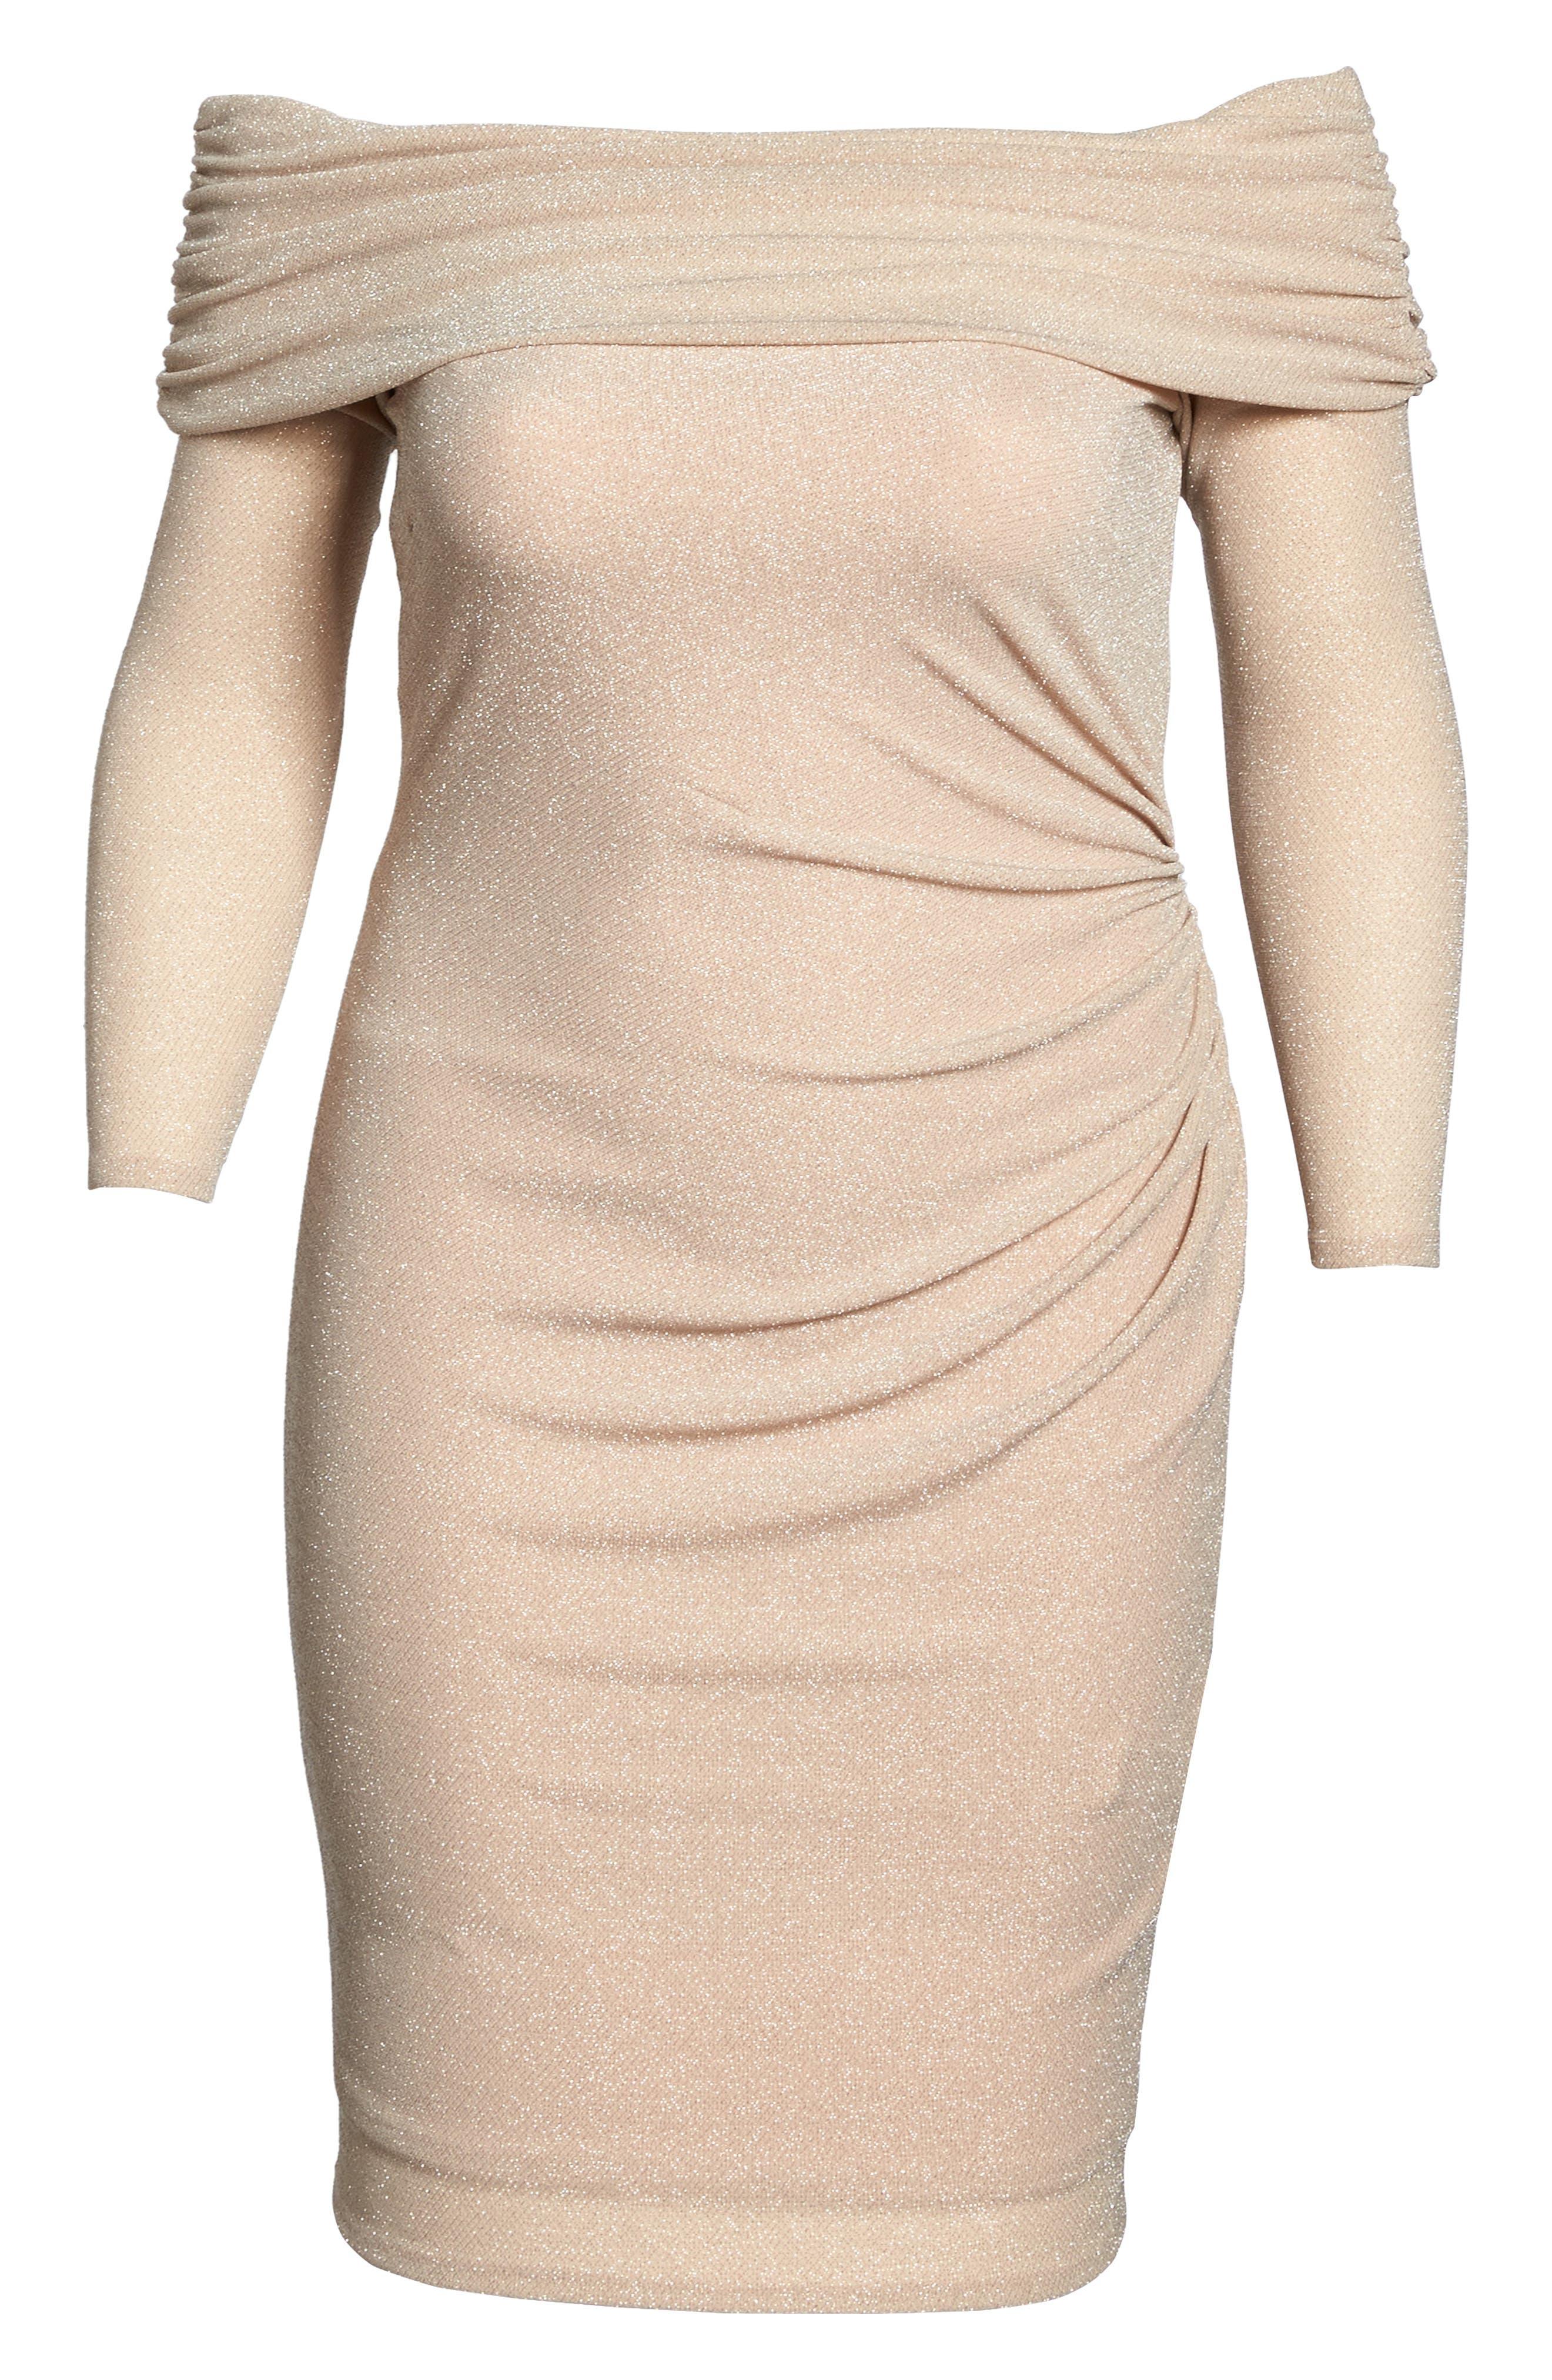 Off the Shoulder Metallic Knit Sheath Dress,                             Alternate thumbnail 6, color,                             684